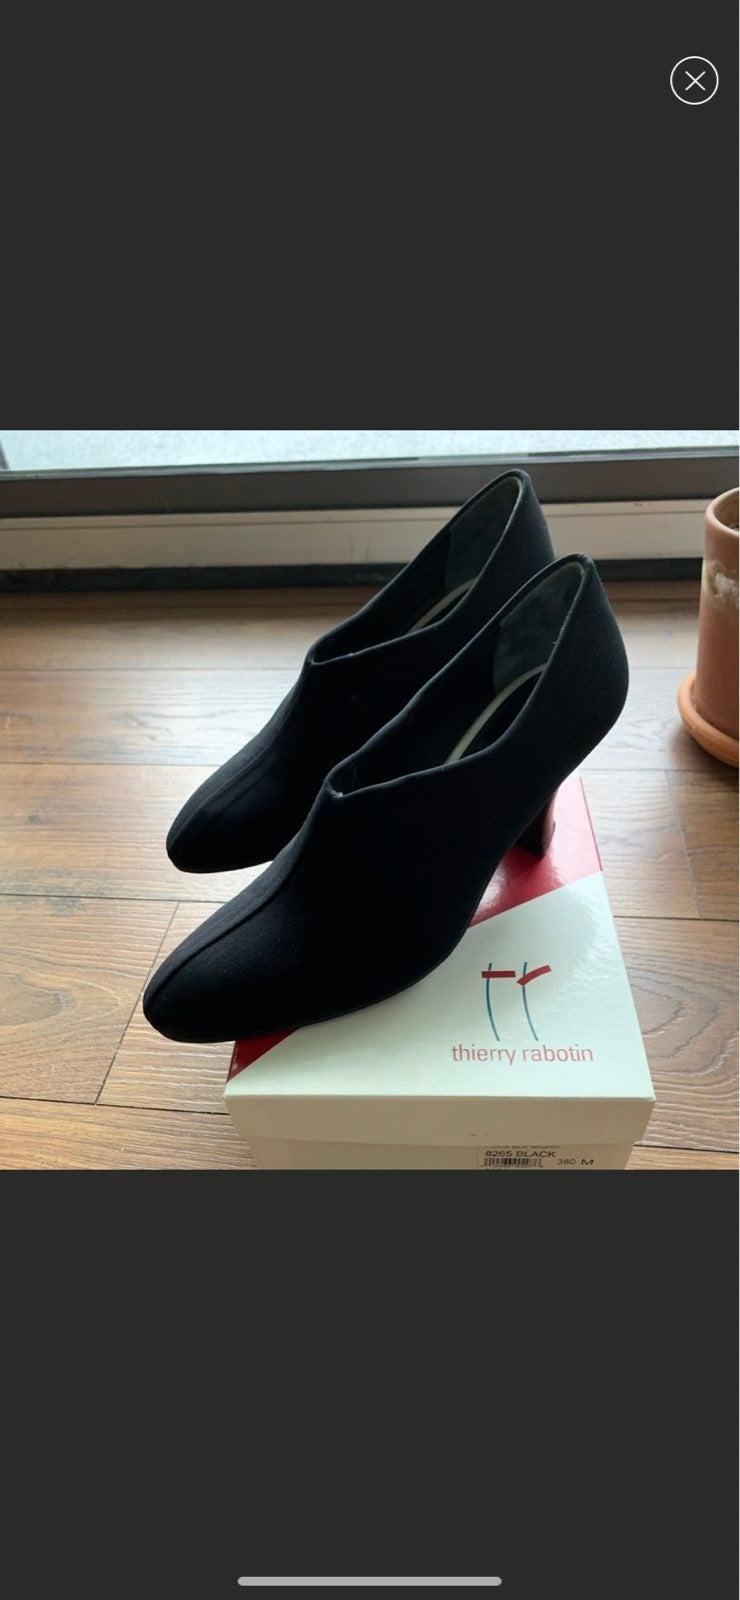 Thierry Rabotin Flair Comfort Shoe